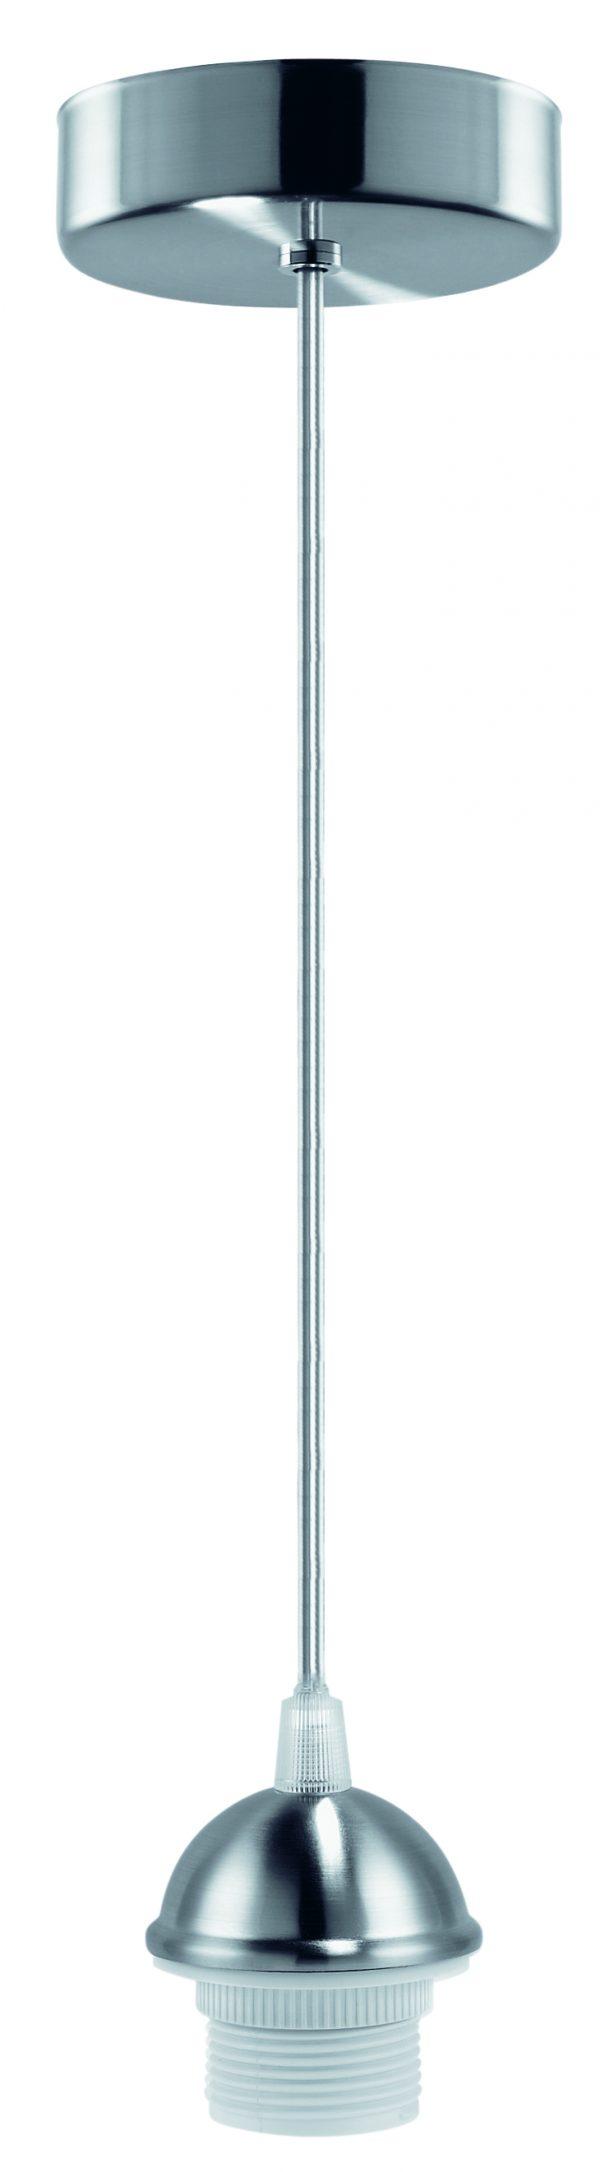 HighLight hanglamp Pendant Ancona - mat staal